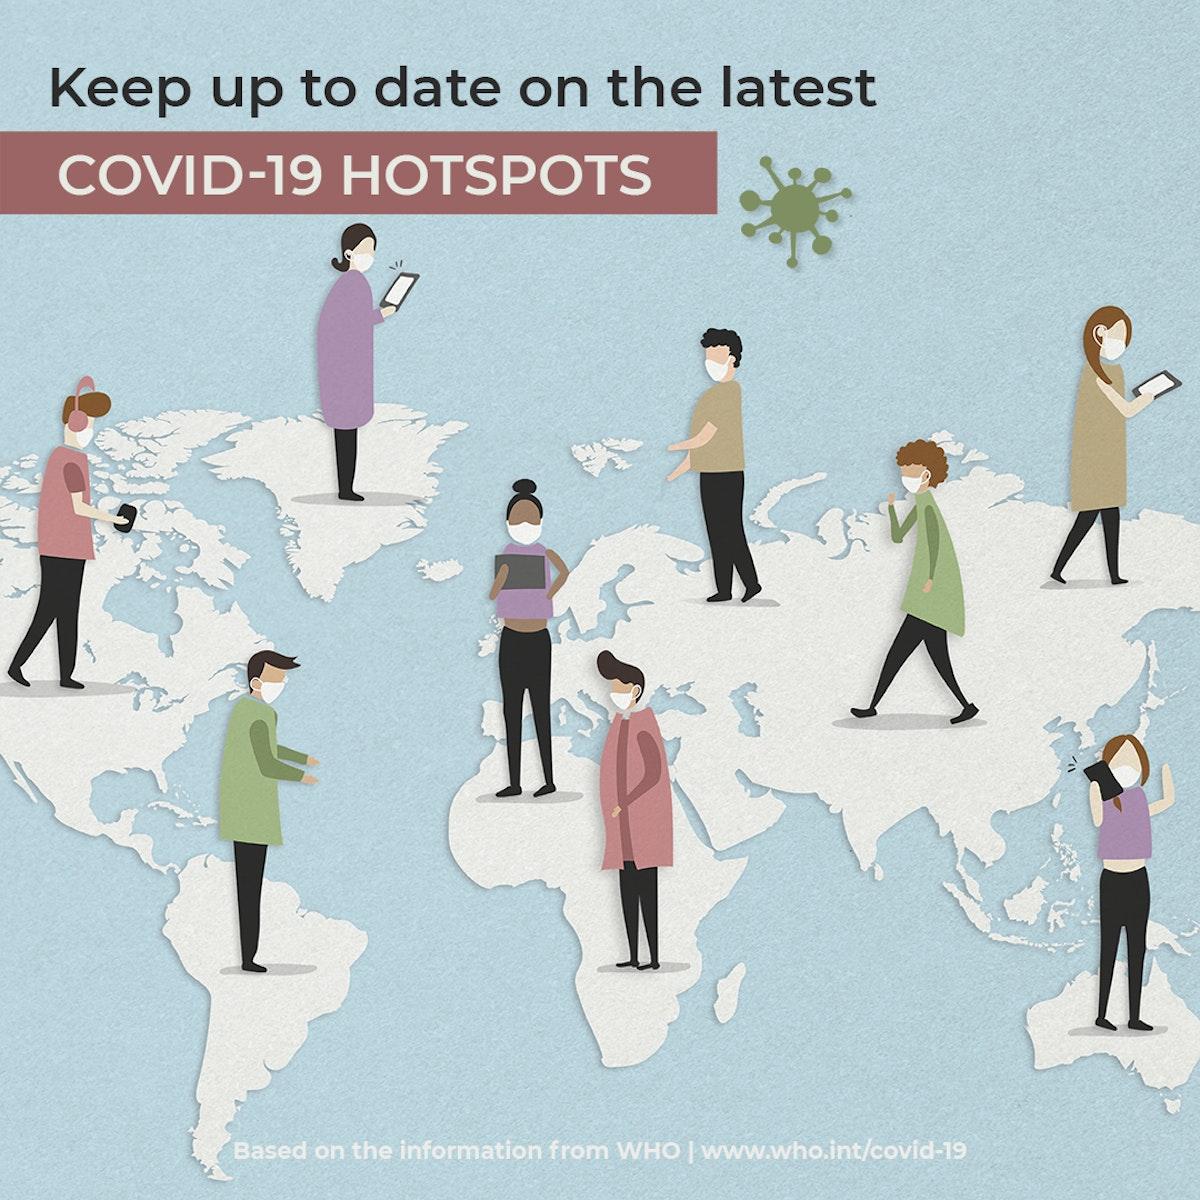 Latest update on COVID-19 hotspot illustration psd mockup social ad